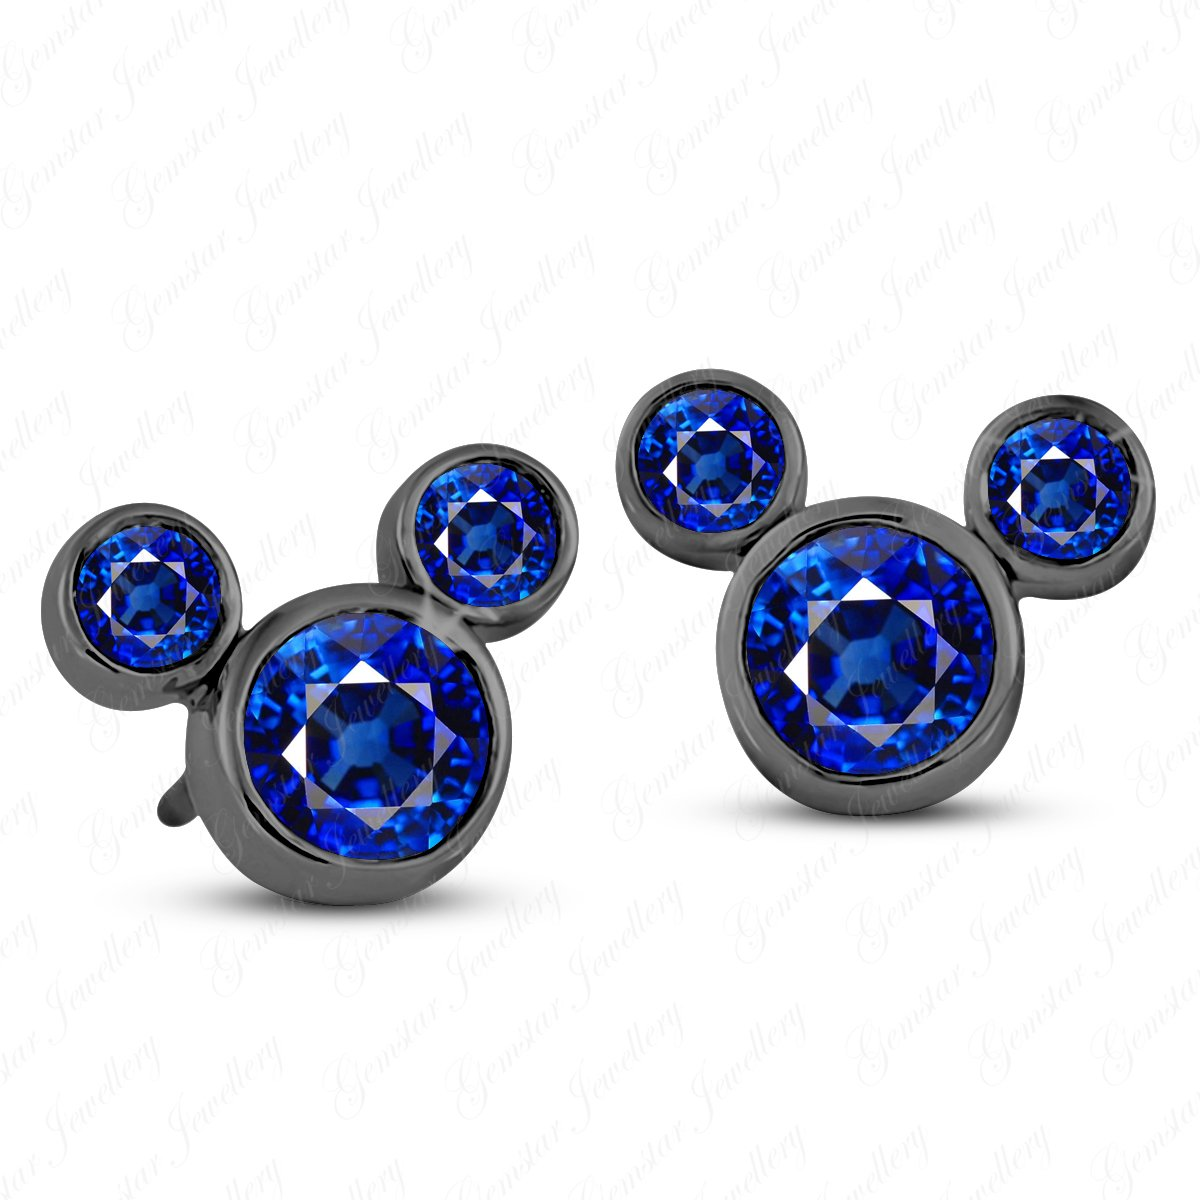 Gemstar Jewellery Disney Mickey Mouse Stud Earrings 14K Black Gold Finish Round Cut Blue Sapphire